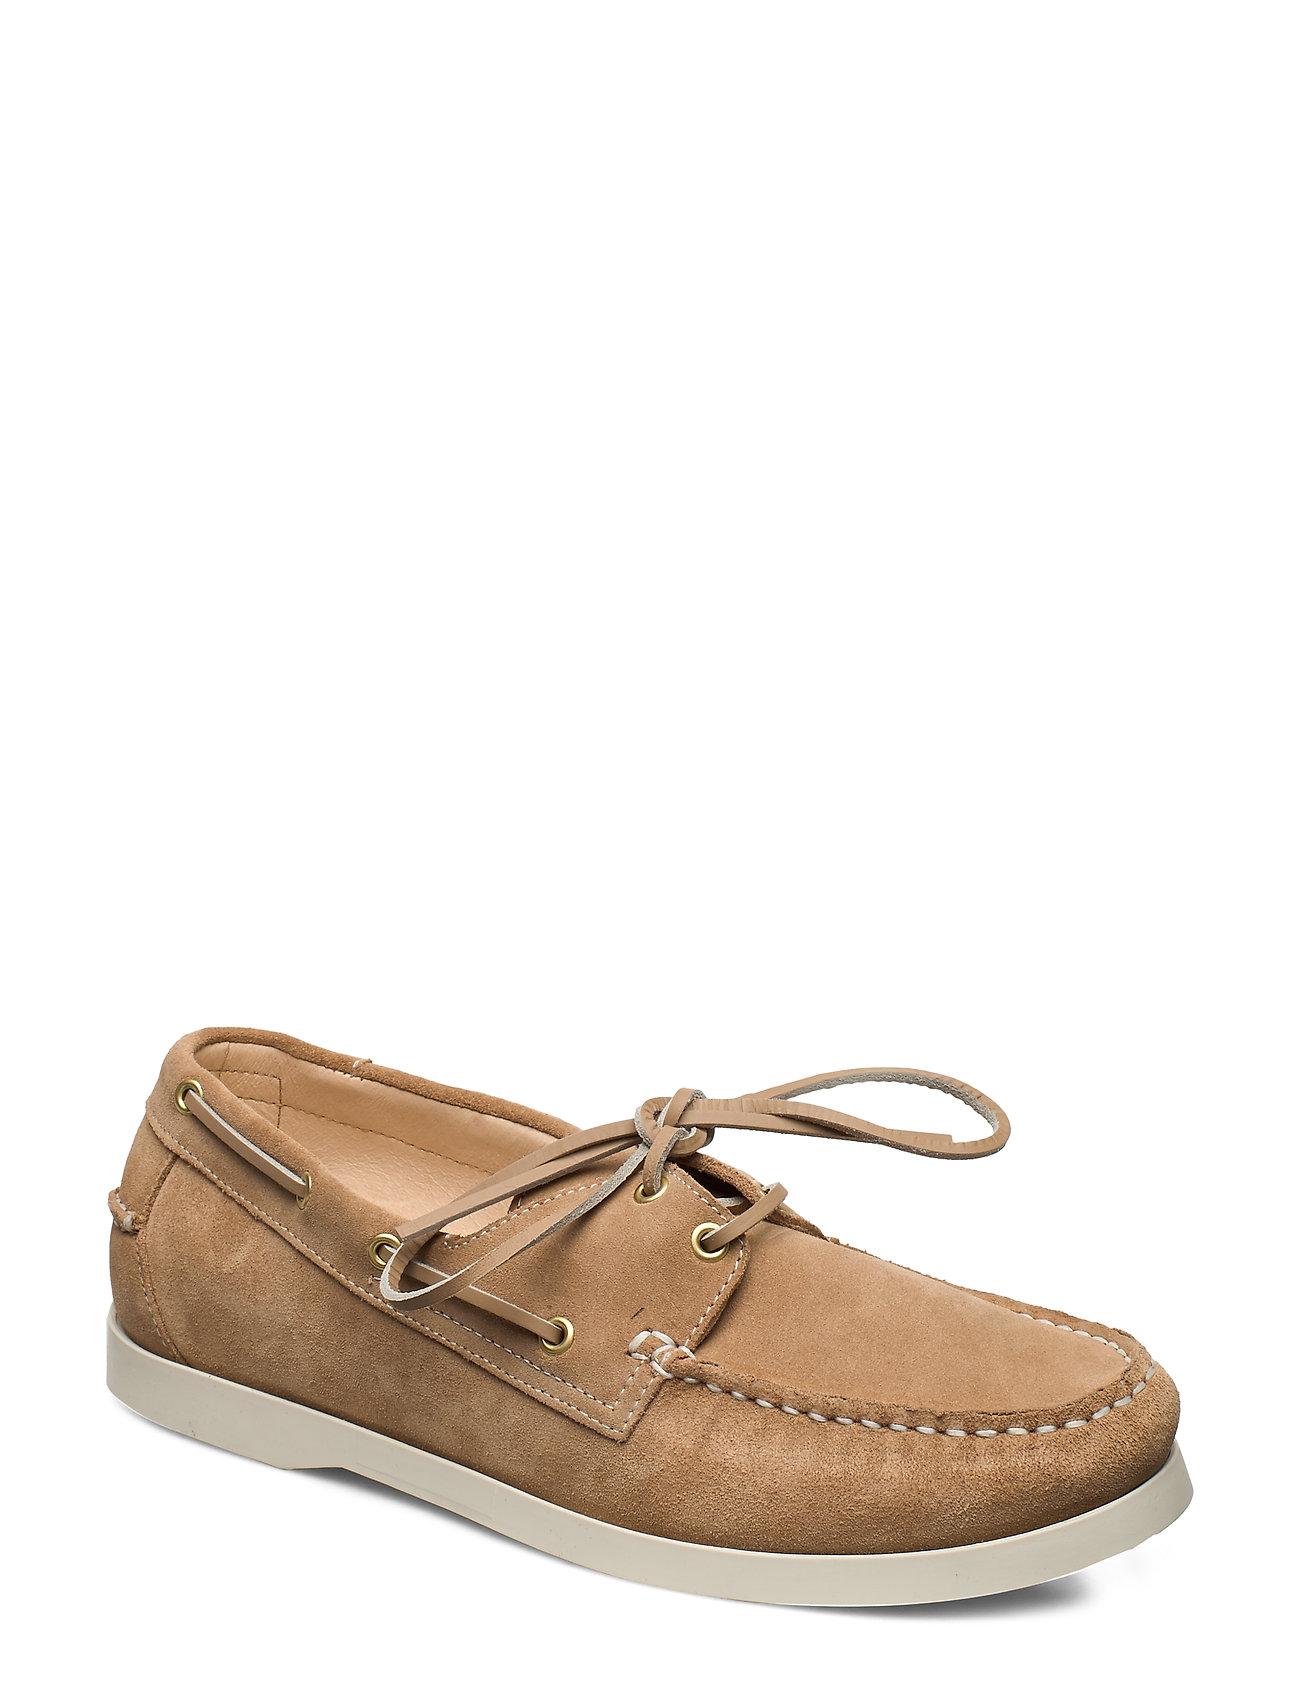 Lindbergh Sailor shoe - KHAKI